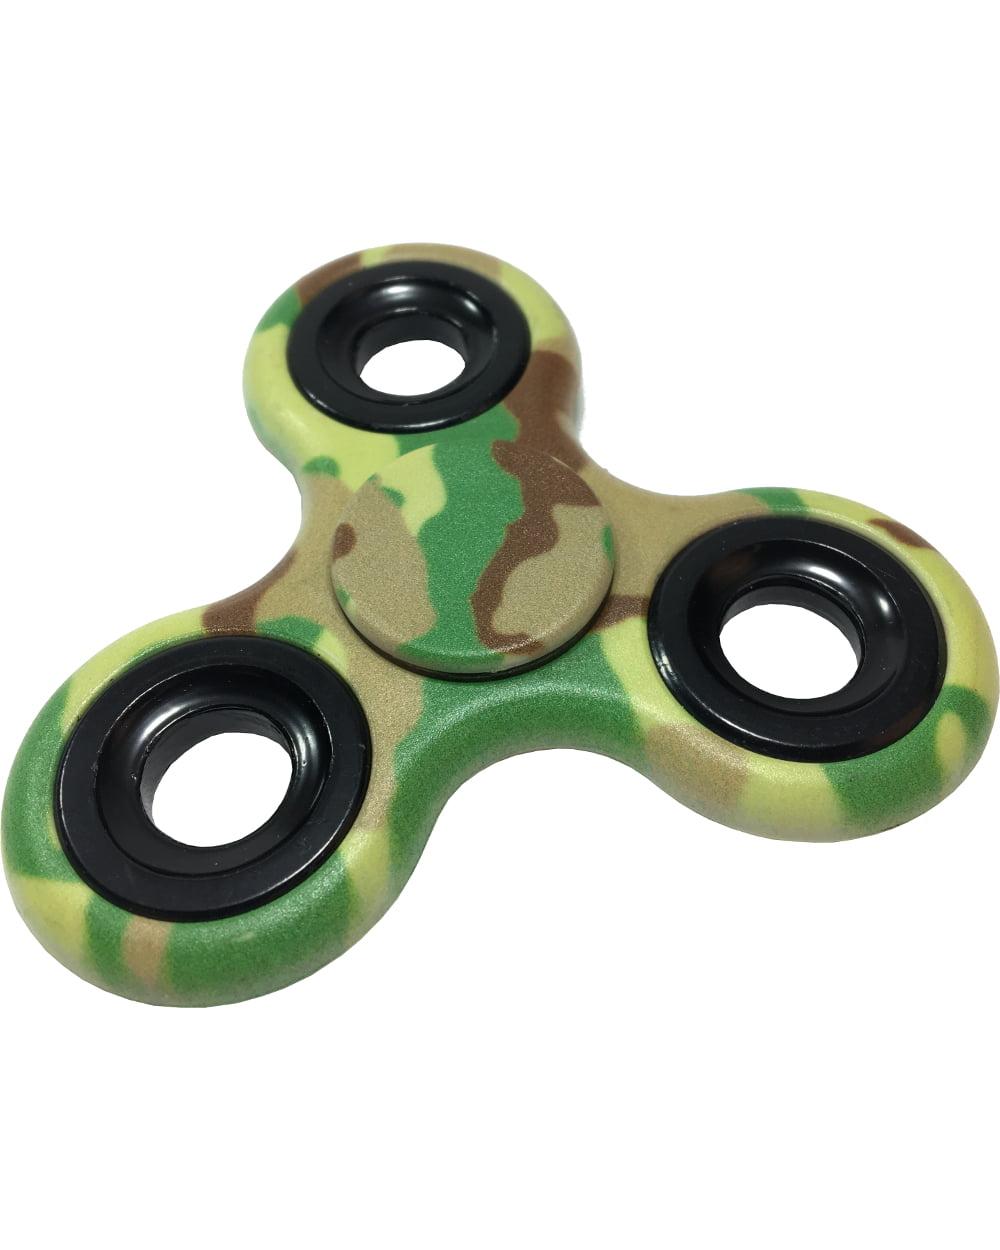 Fidget Spinner High Speed Green Light Up Weights Relief Toy